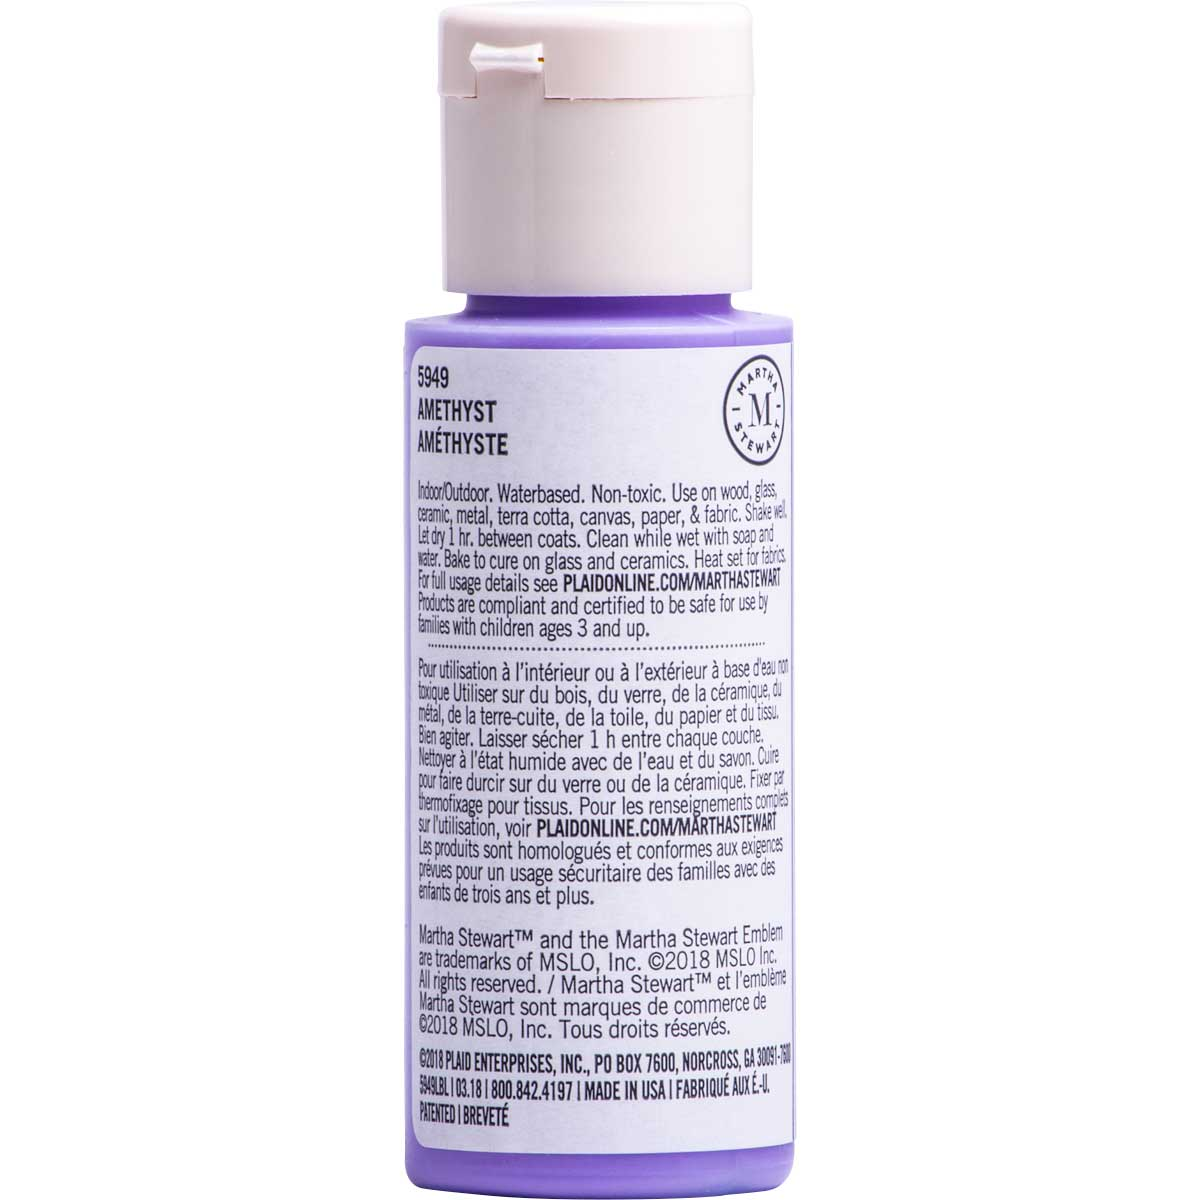 Martha Stewart ® Multi-Surface Satin Acrylic Craft Paint CPSIA - Amethyst, 2 oz. - 5949